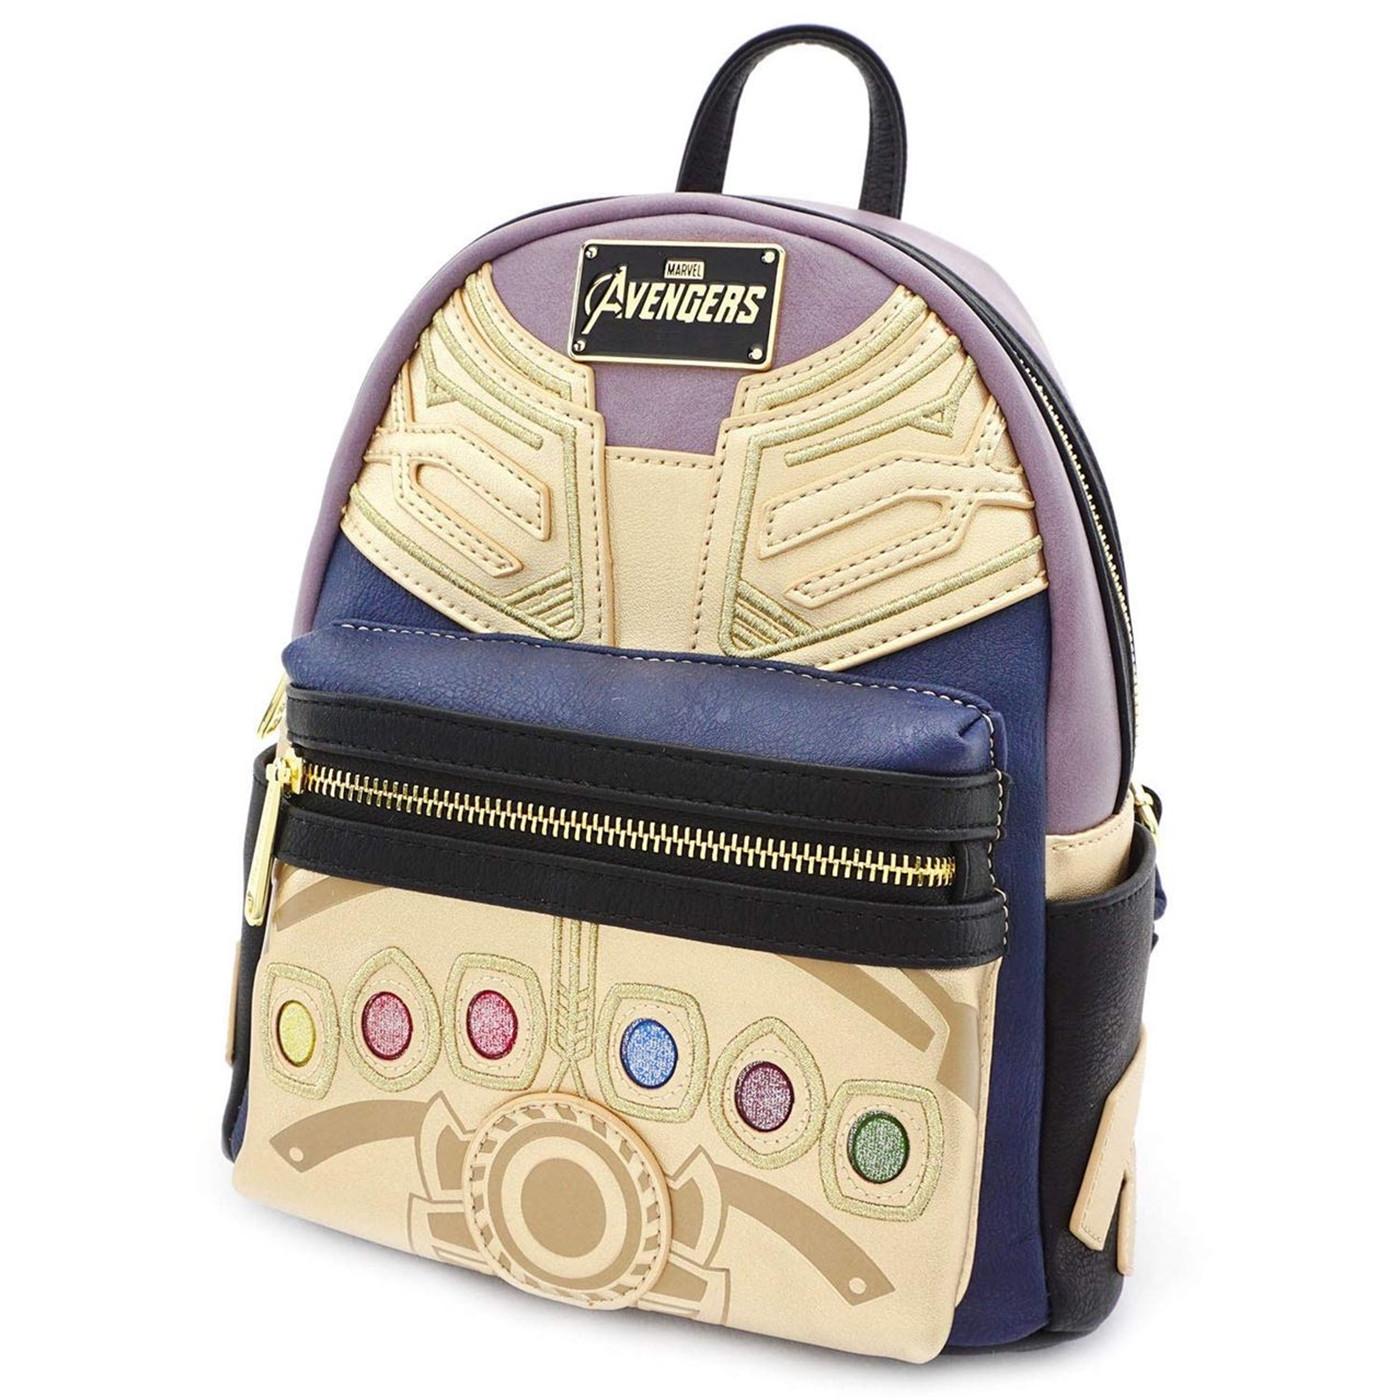 Avengers Endgame Movie Thanos Infinity Gauntlet Mini Backpack